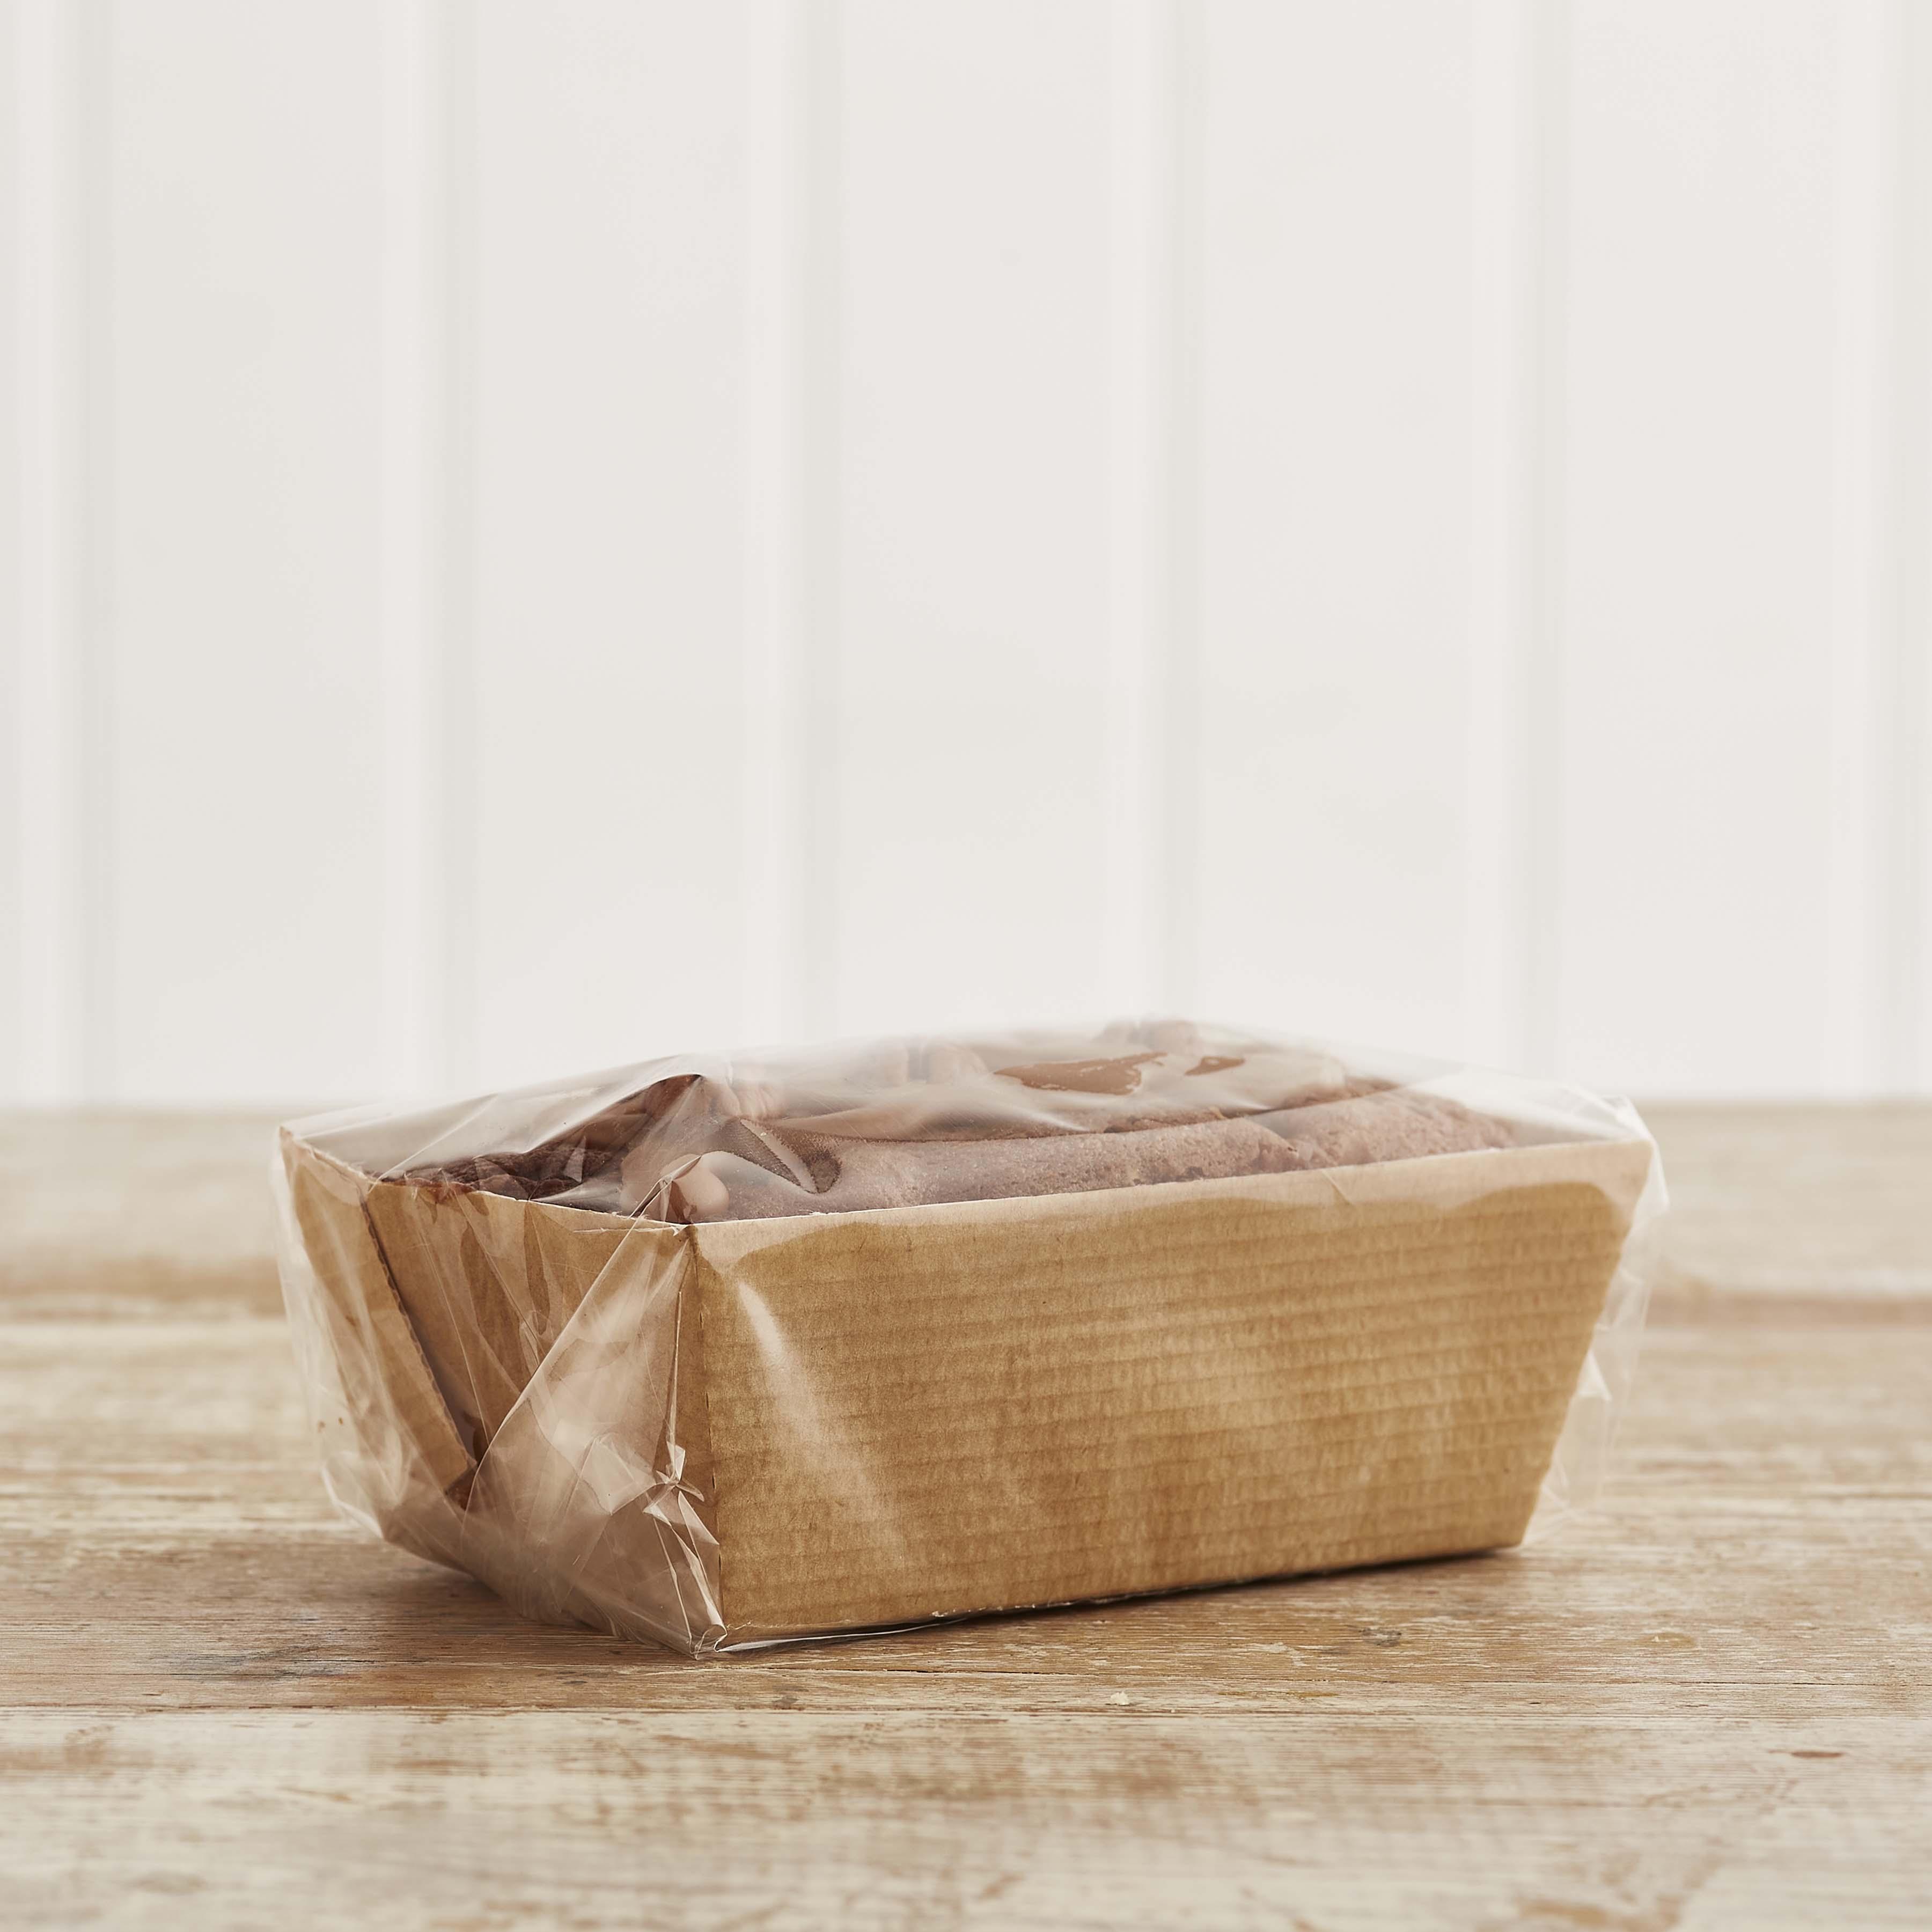 The Original Cake Company Sticky Toffee and Date Sponge, 250g